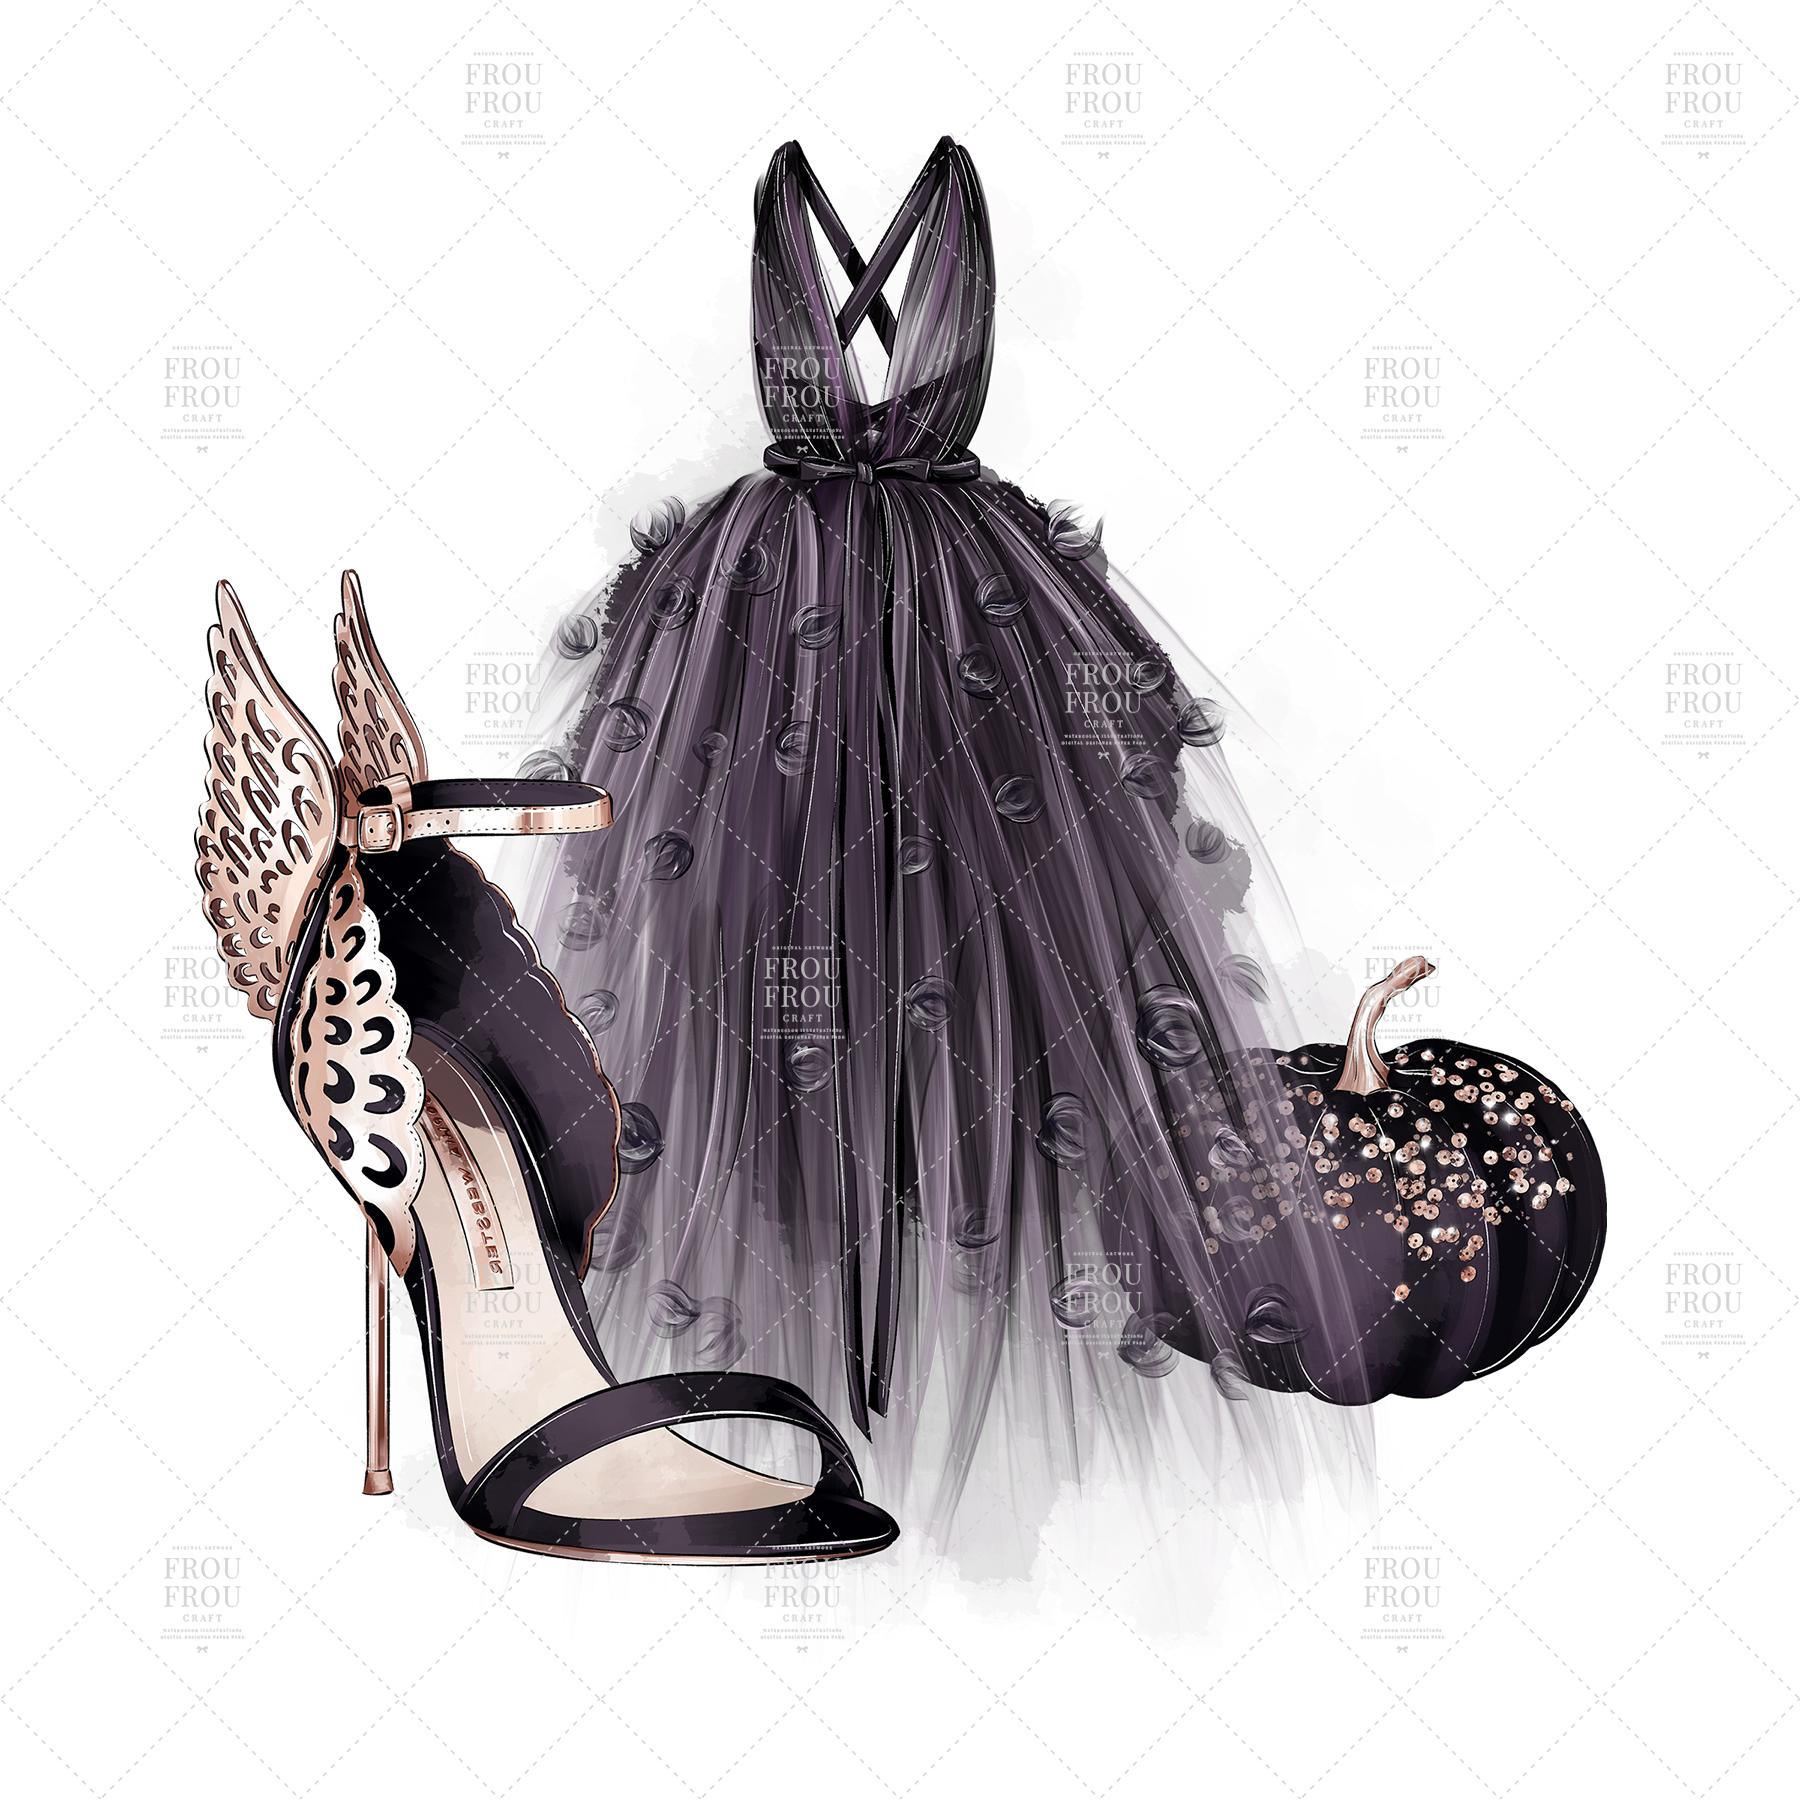 Halloween Fashion Black Dress Gold Jewelry Clip Art example image 7